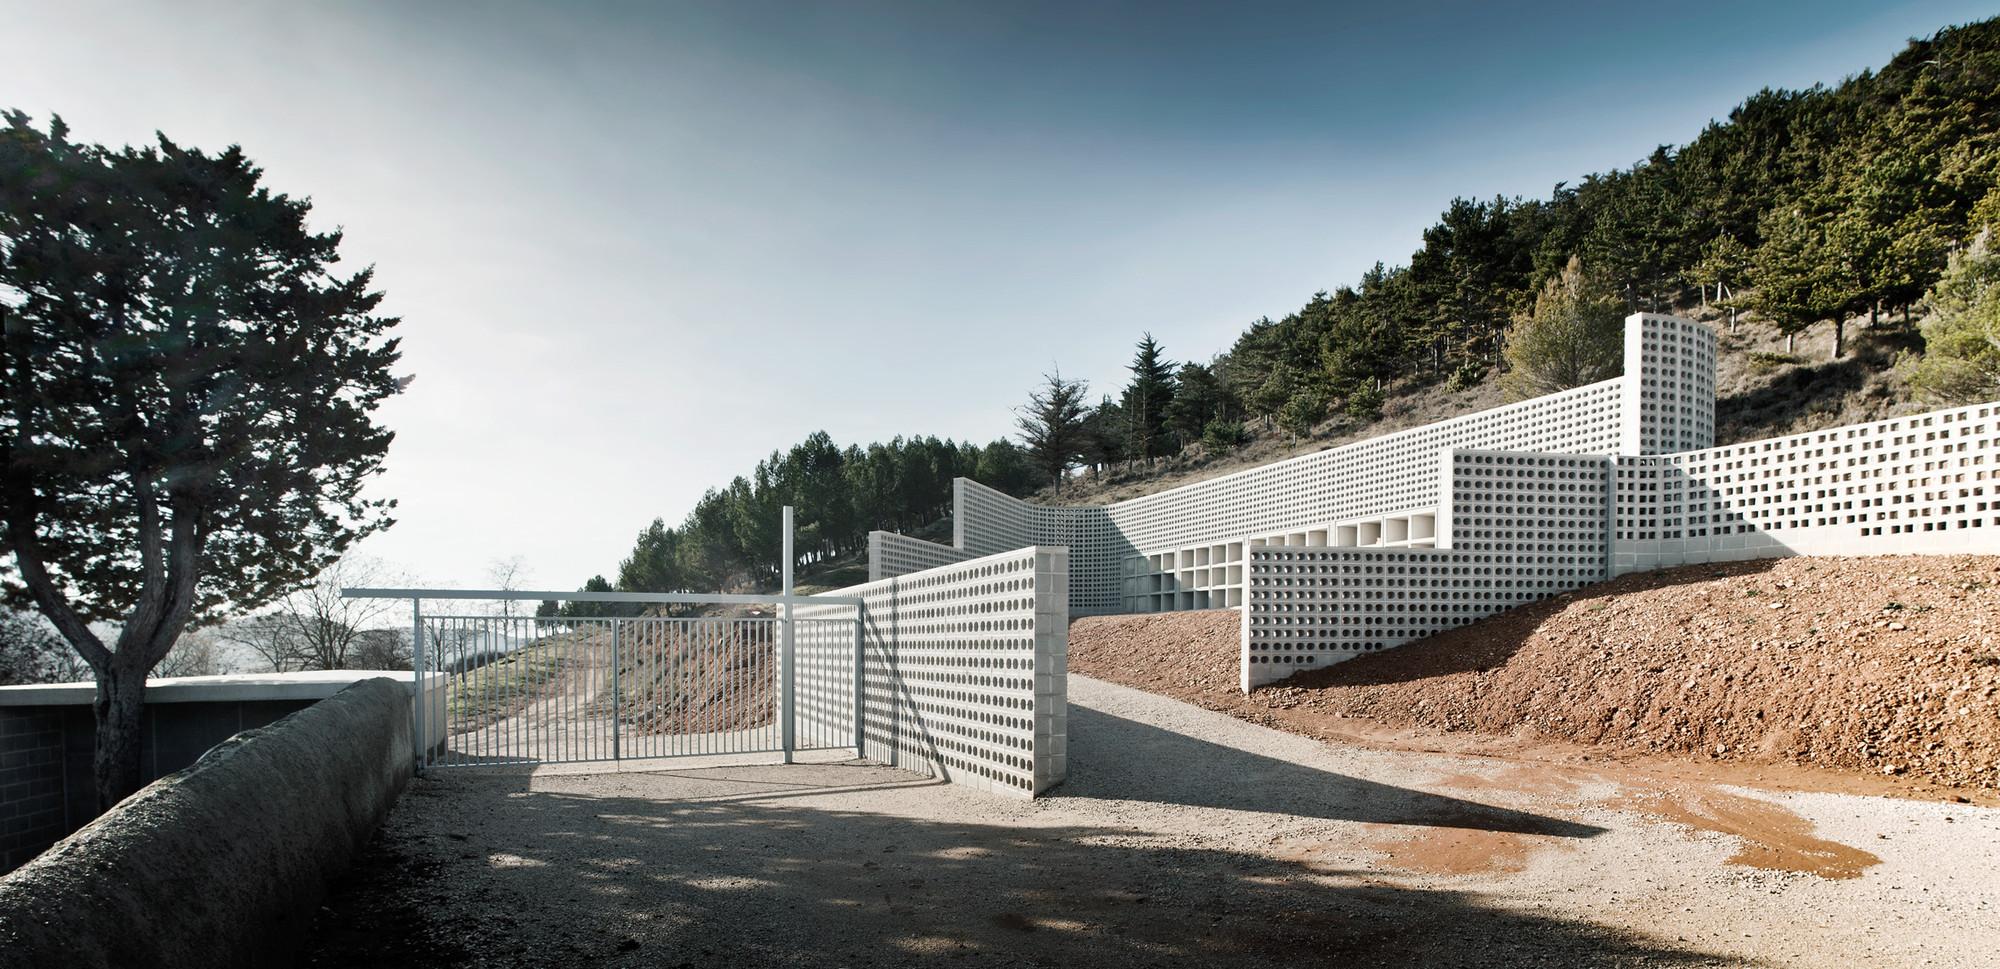 Ampliación Del Cementerio Municipal De Añorbe / MRM Arquitectos, © Mikel Muruzabal